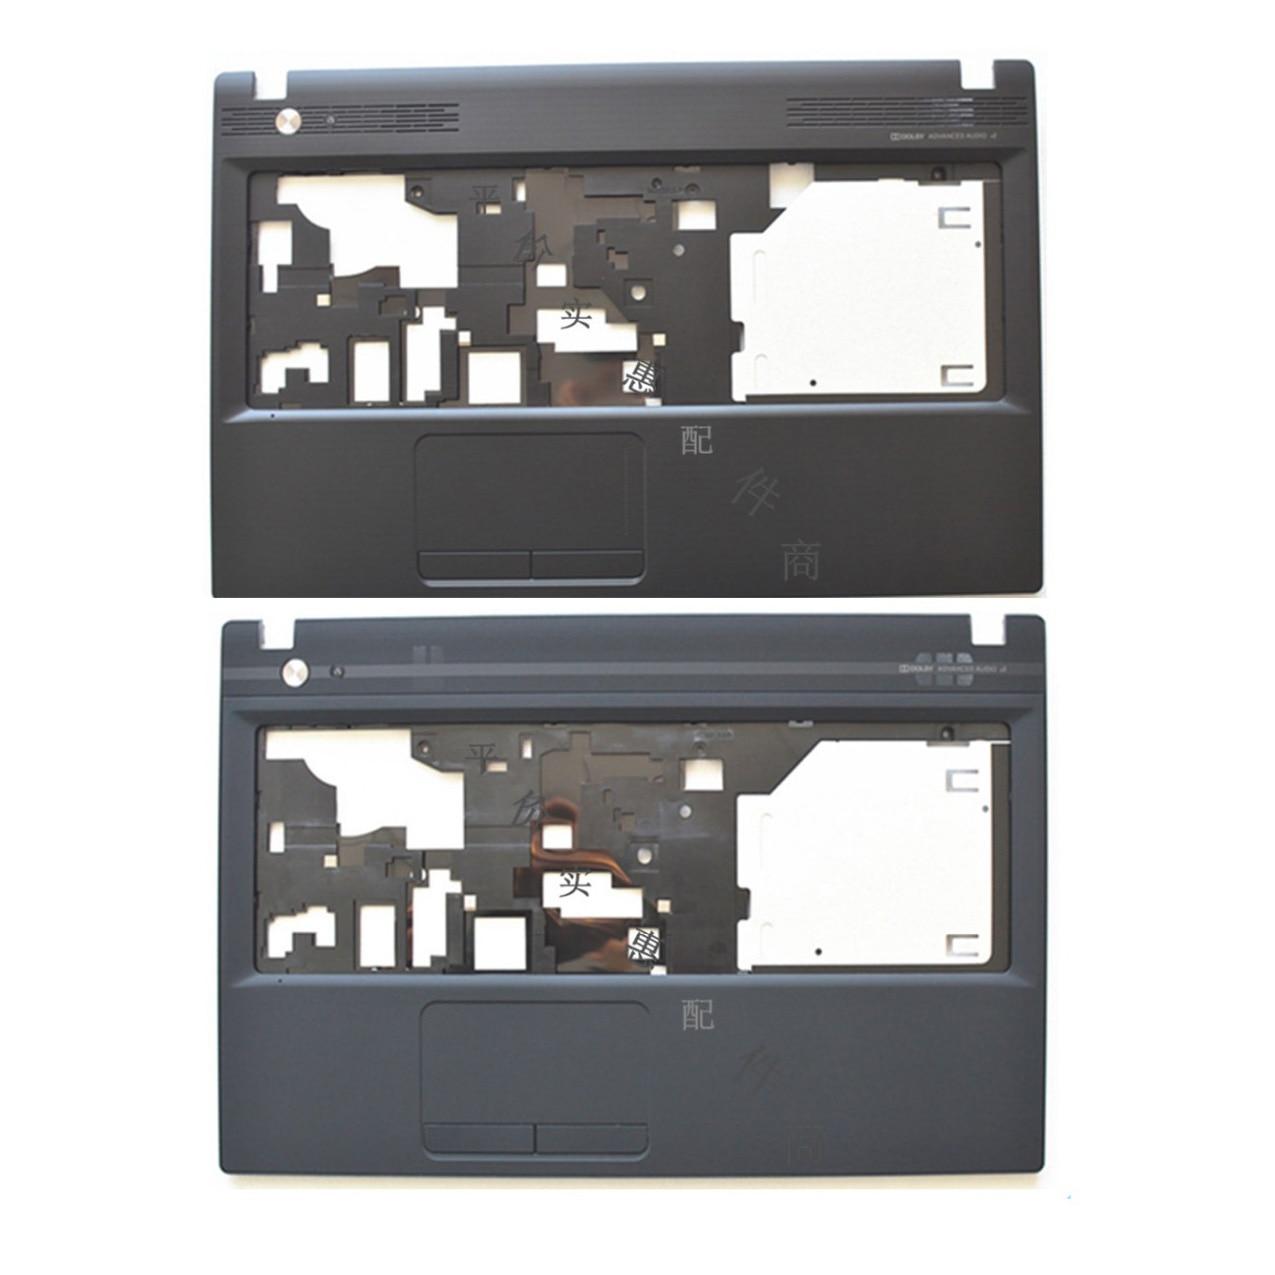 جديد لينوفو P580 P585 N580 N581 N585 Palmrest حالة العلوي غطاء AP0QN000700 AP0QN000800 AP0QN000801